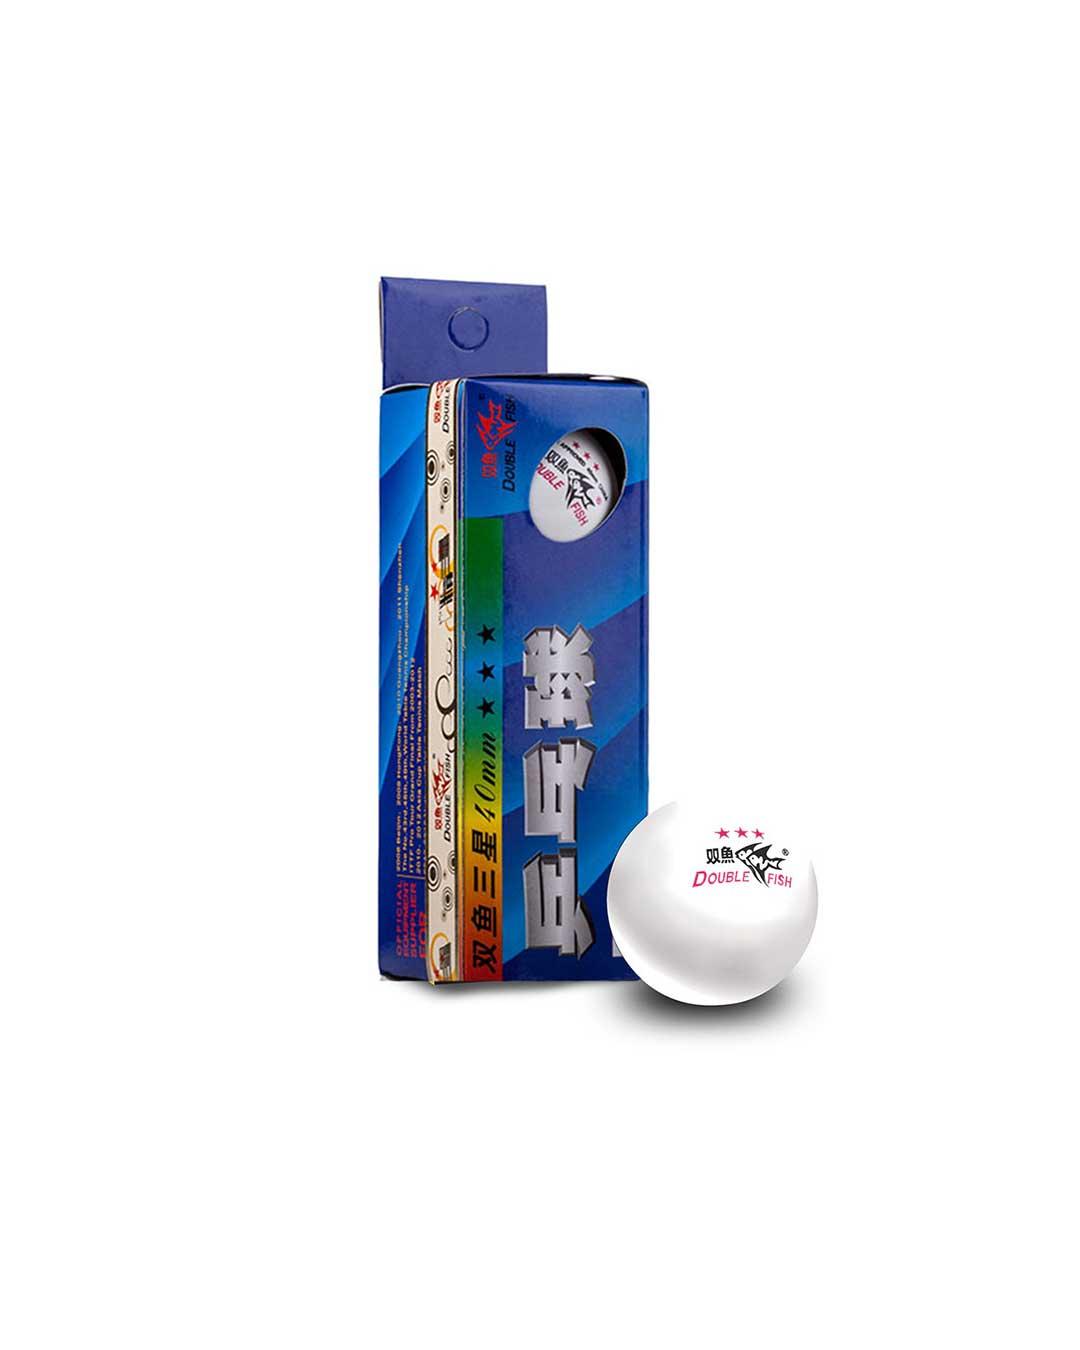 Pelota de Tenis de Mesa marca Double Fish 3 estrellas material Celuloide (incluye 3 pelotas blancas)